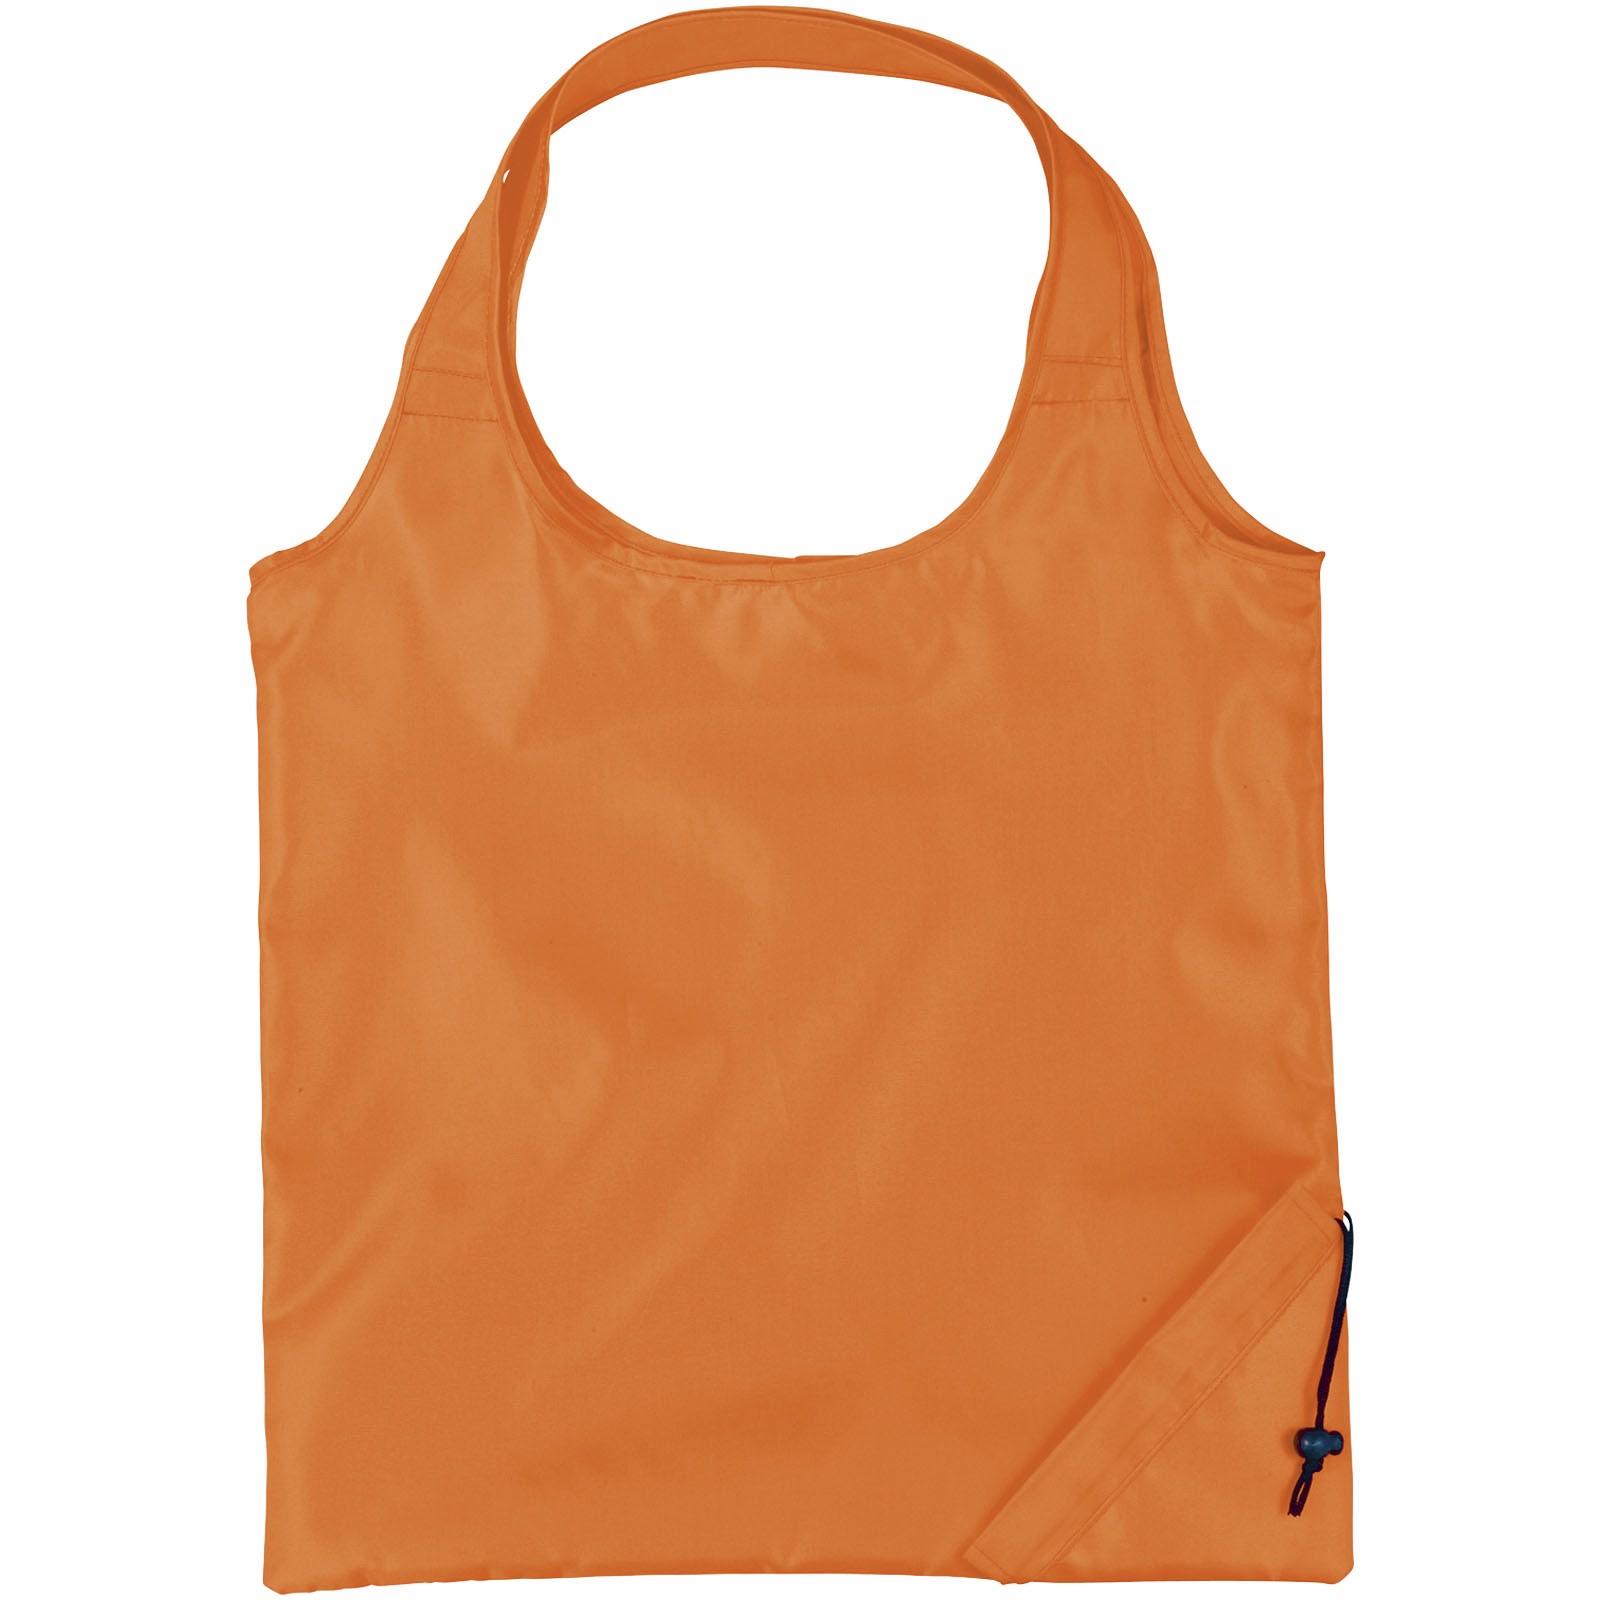 Bungalow faltbare Polyester Tragetasche - Orange